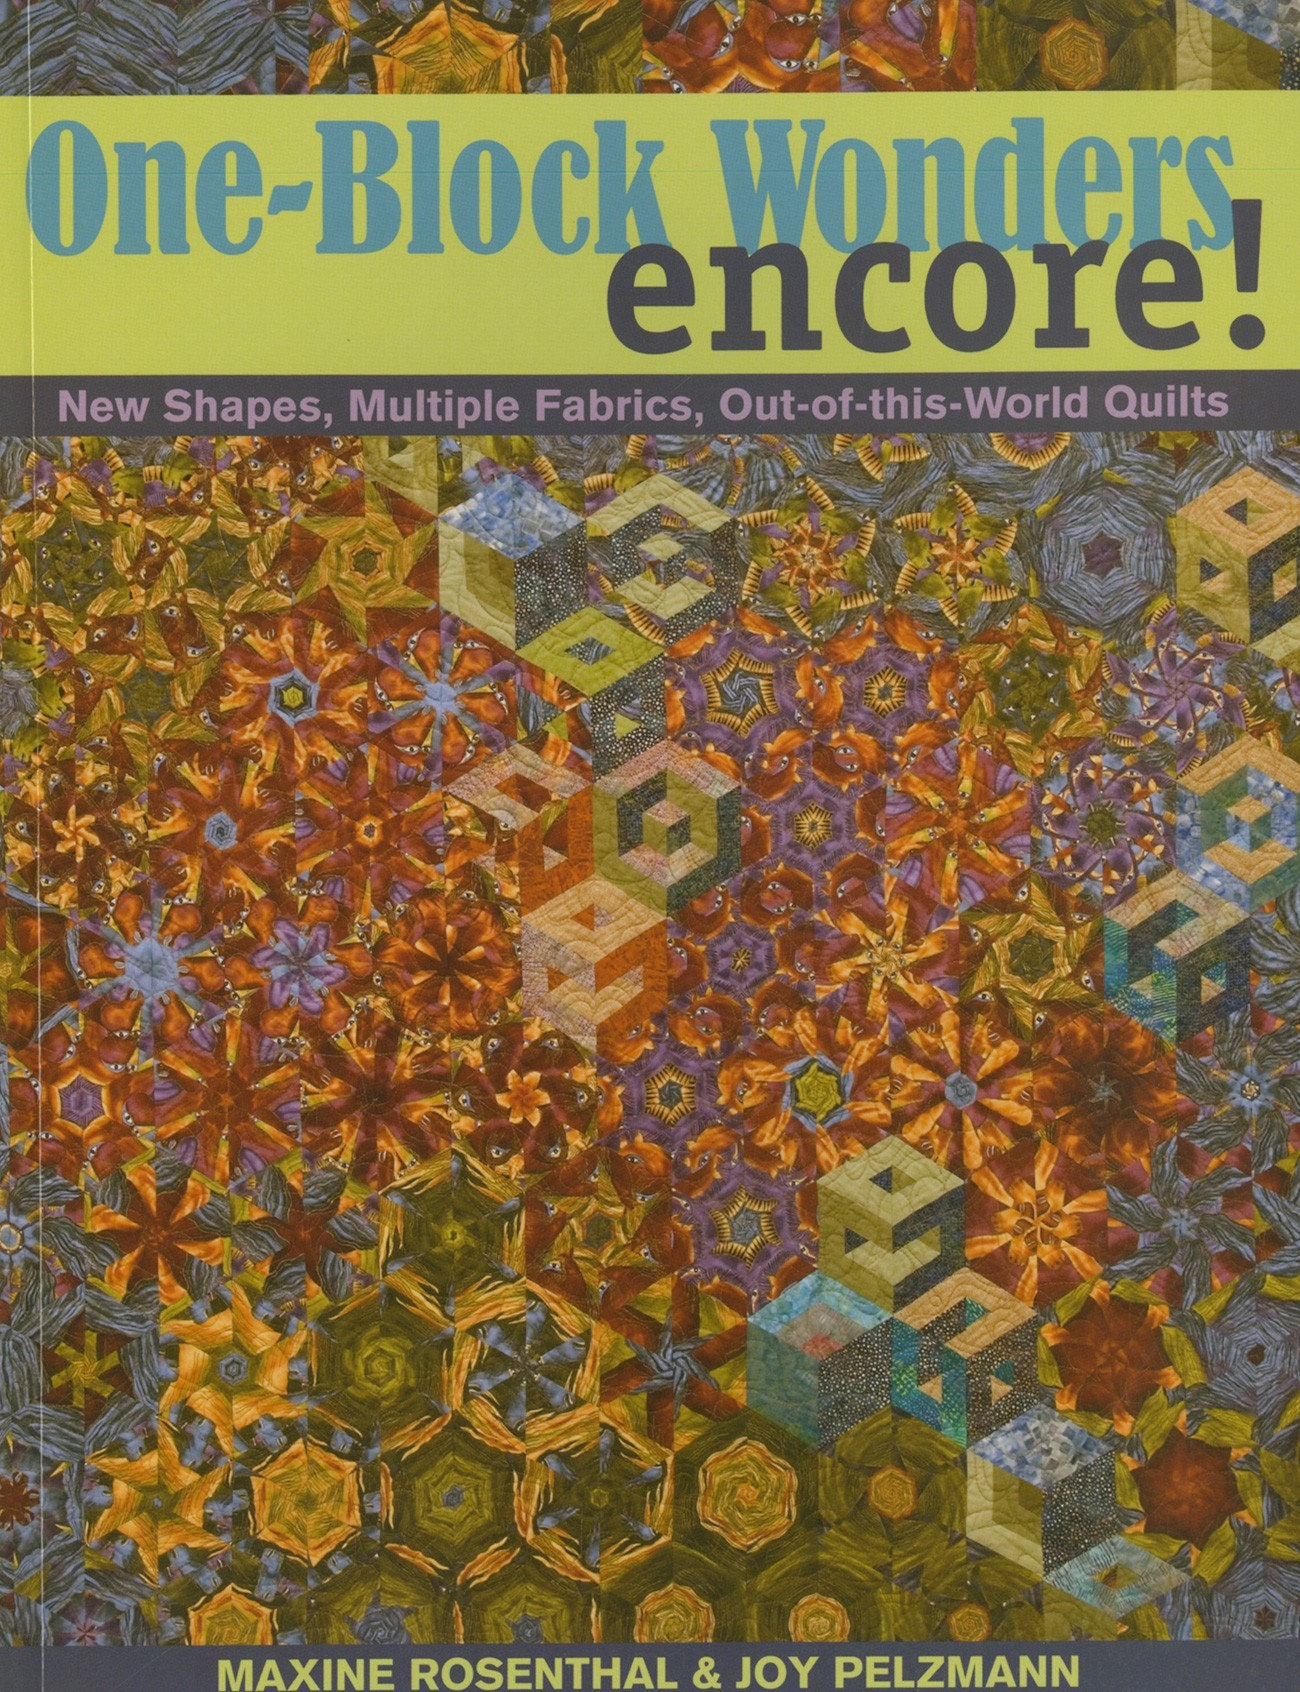 OBW quilts images   One block wonder